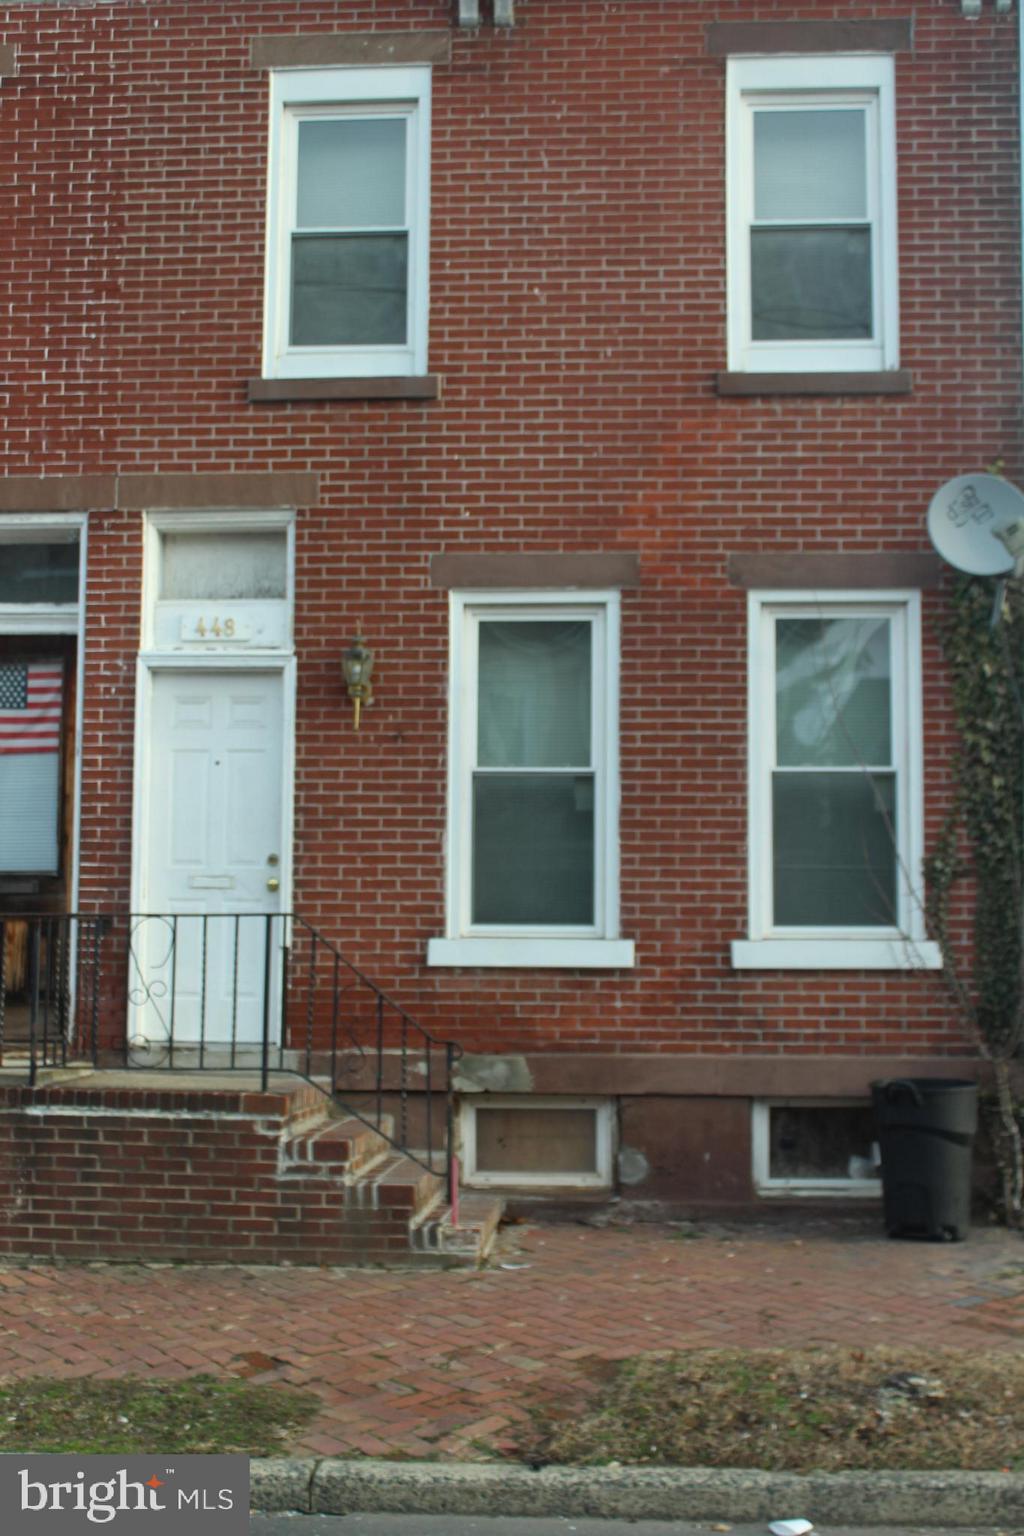 448 W HANOVER ST, TRENTON, NJ 08608